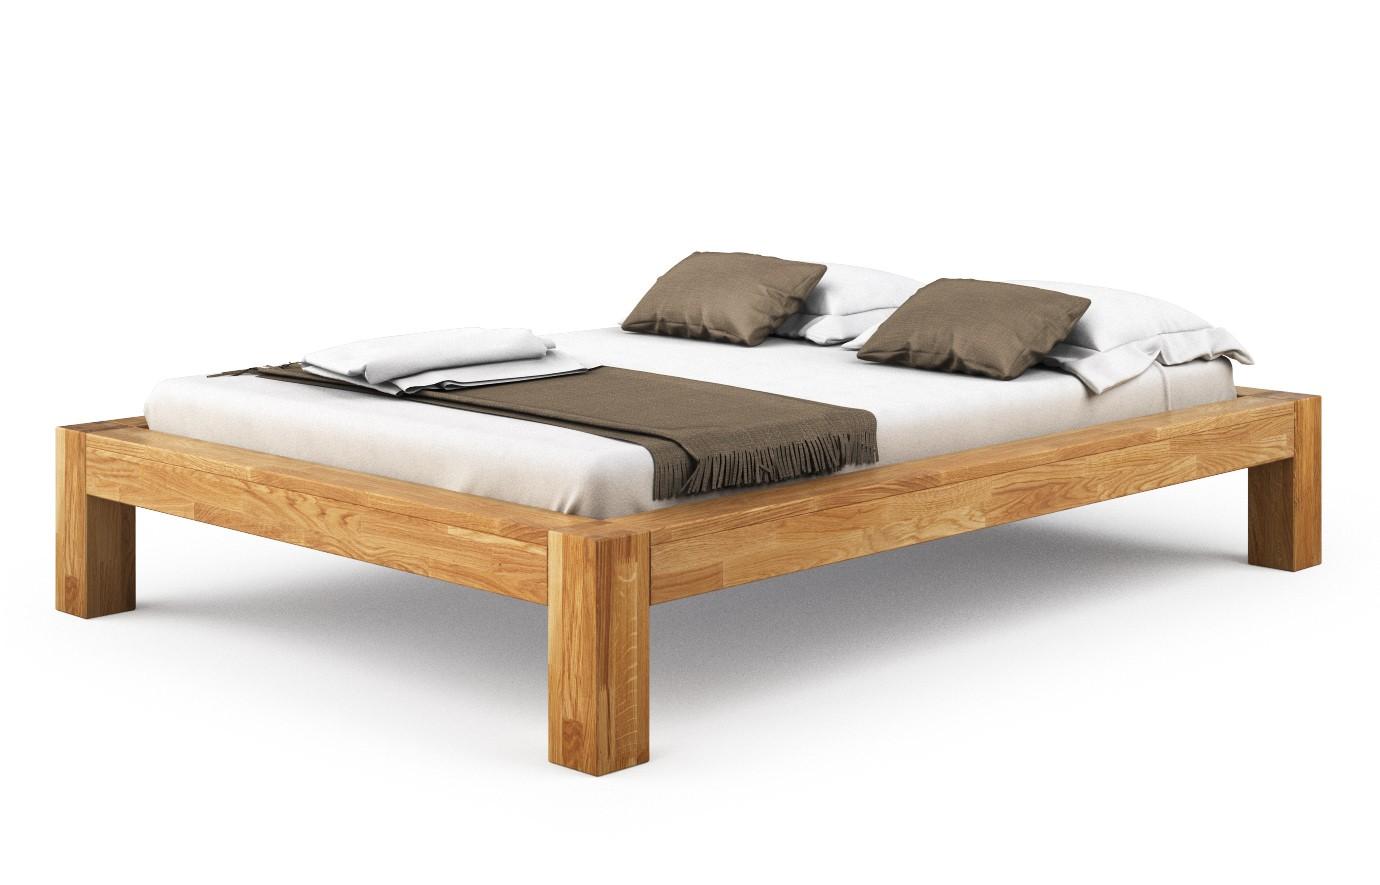 Full Size of Rustikales Bett Rustikale Betten Bettgestell Holzbetten Rustikal Selber Bauen Kaufen Gunstig Aus Holz Massivholzbetten 140x200 Ontario In Eiche Möbel Boss Bett Rustikales Bett